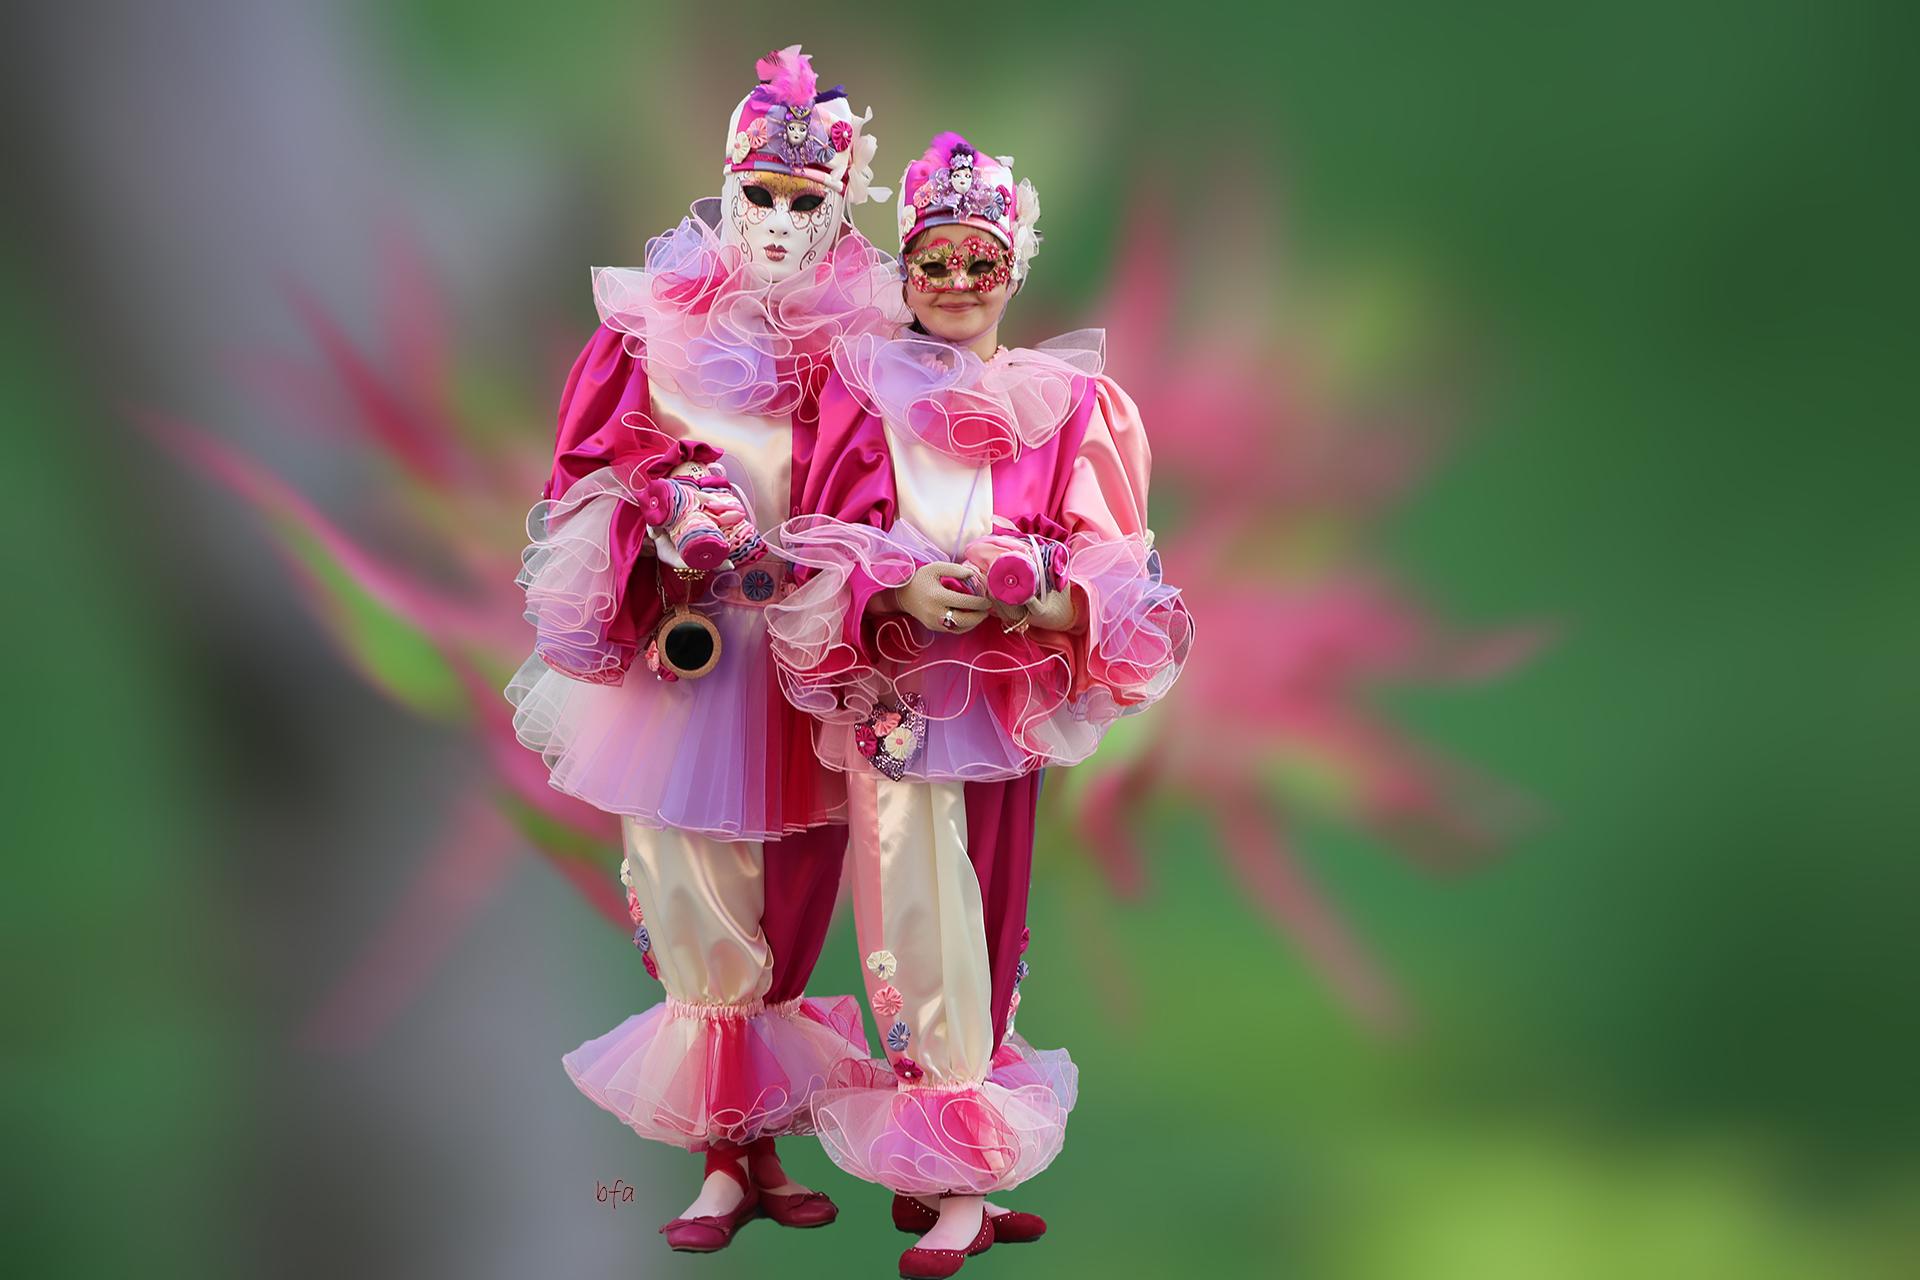 Fleurs de tulle - Photo Blandine et Francis Aubertin